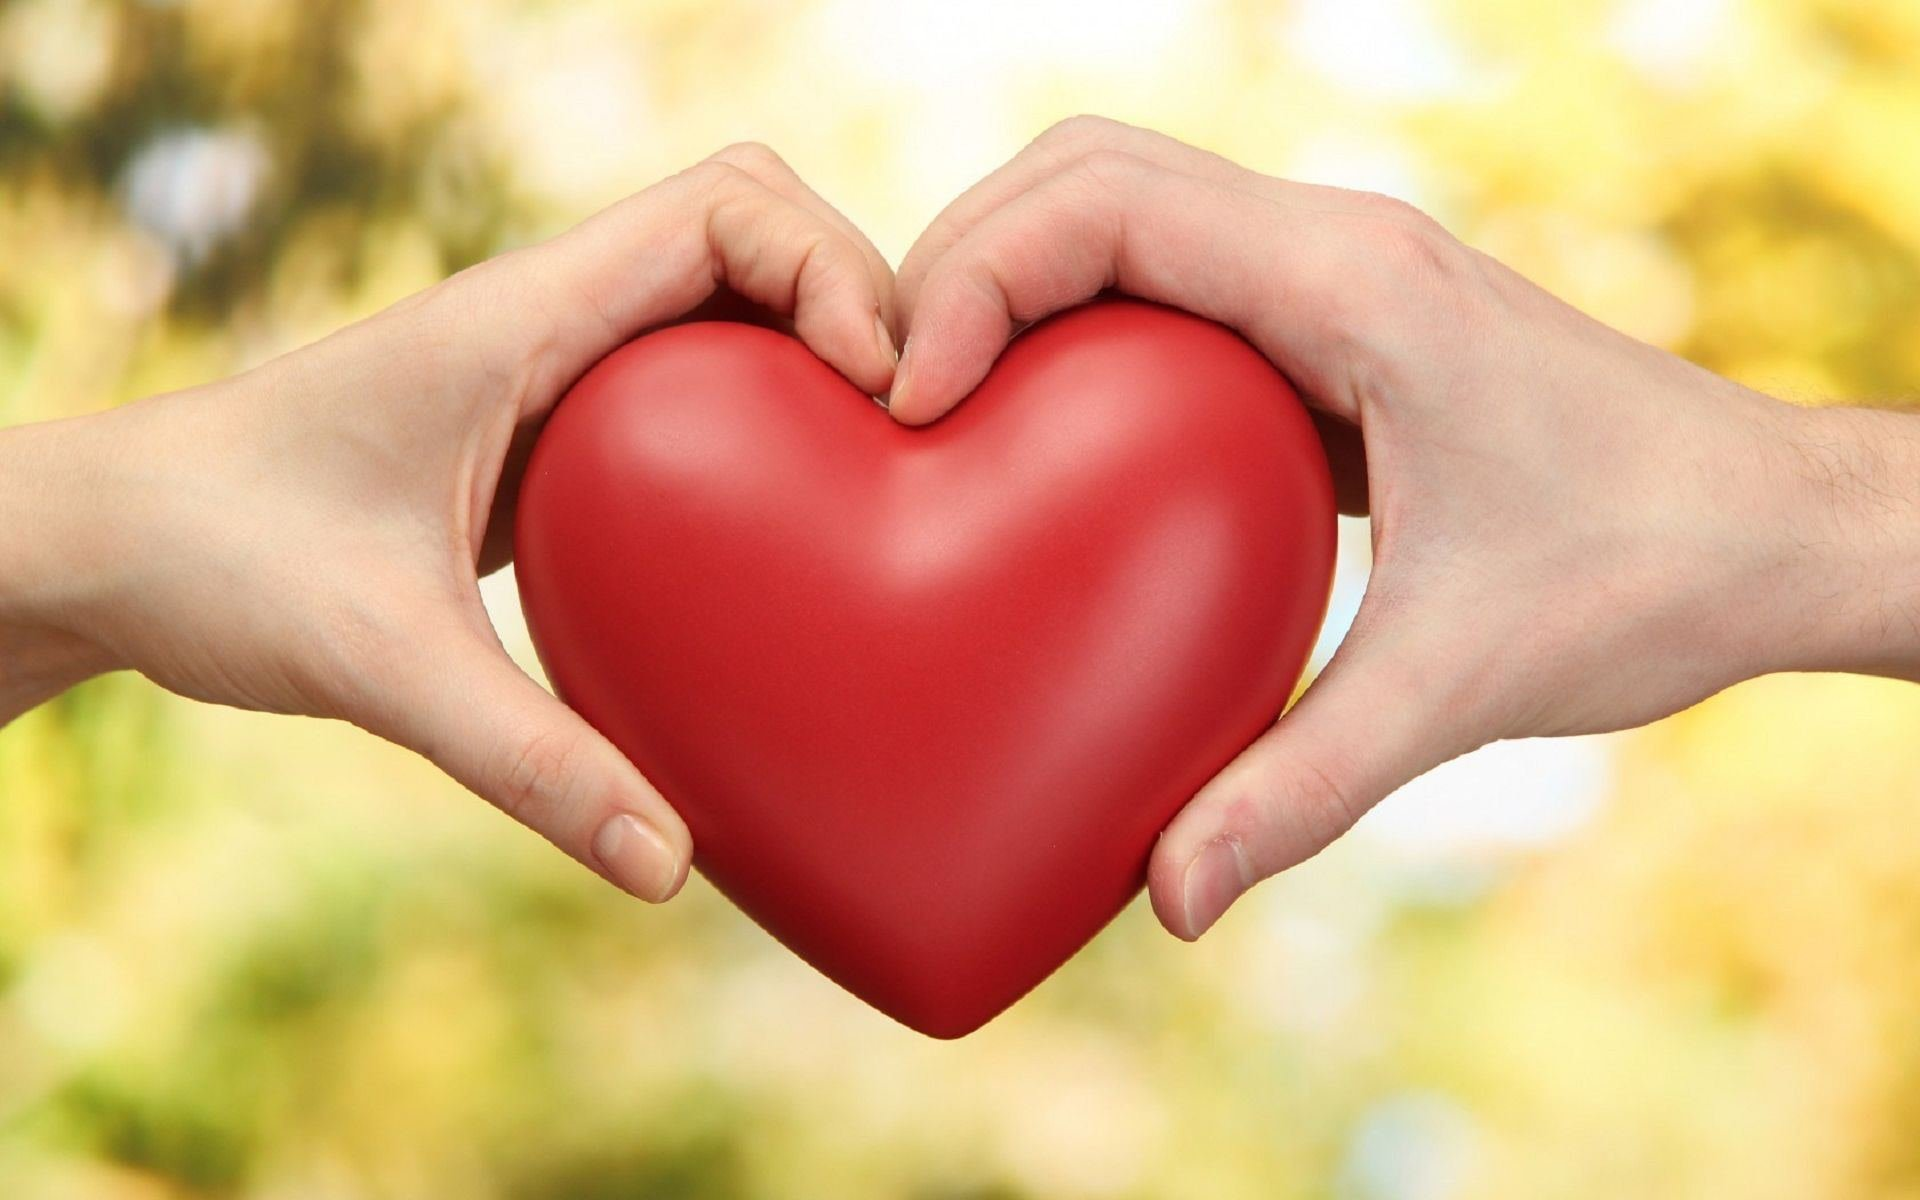 o型女性,恋愛에 대한 이미지 검색결과